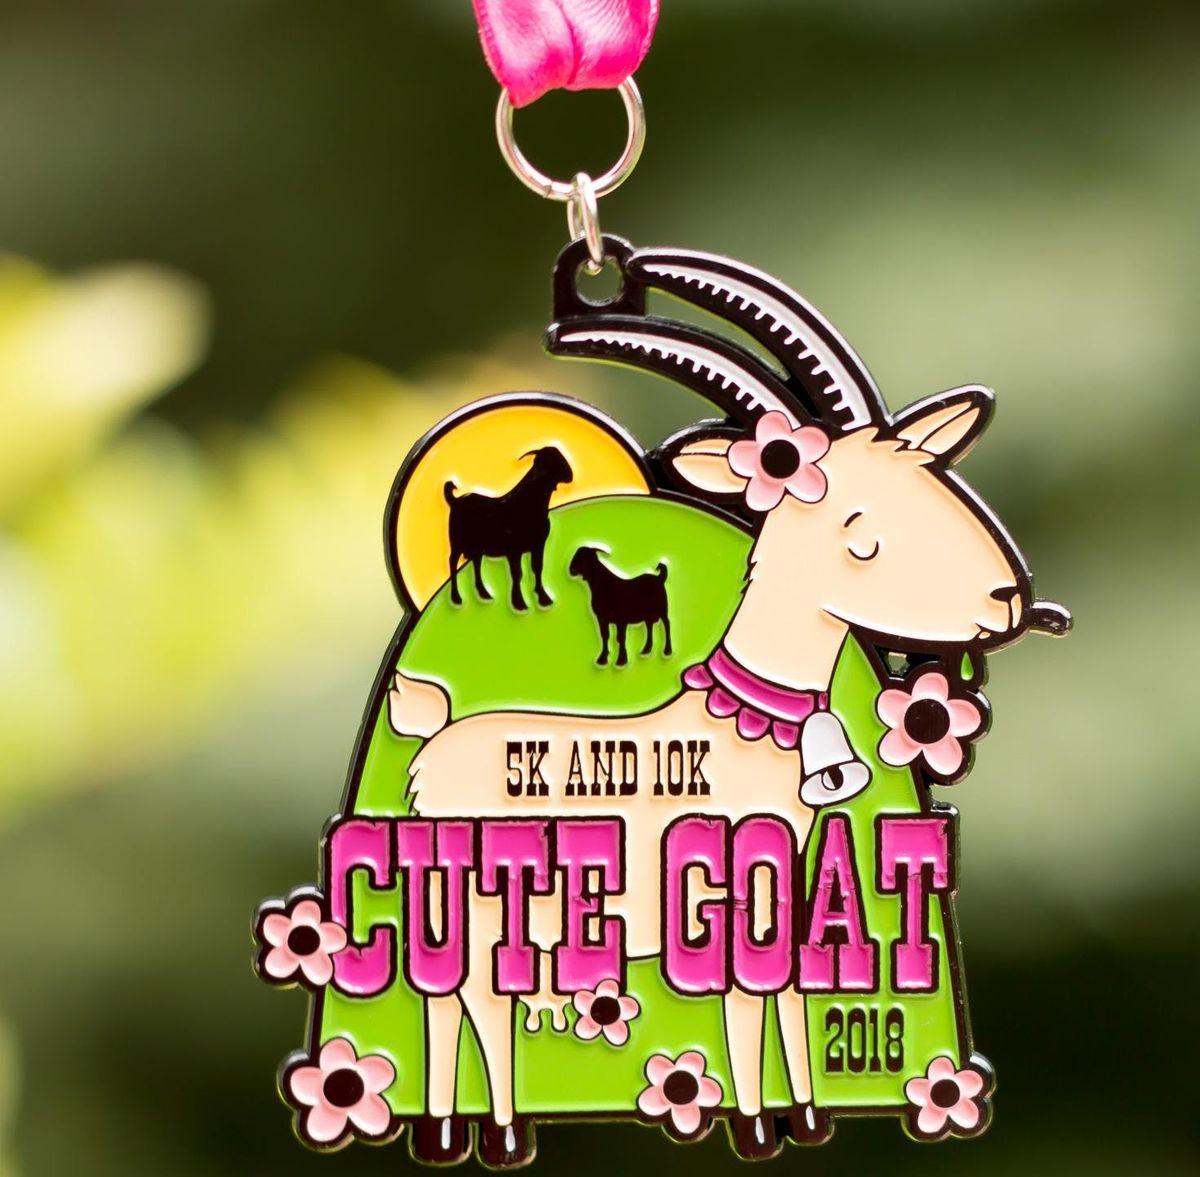 Now Only 10 Cute Goat 5K & 10K - Charleston